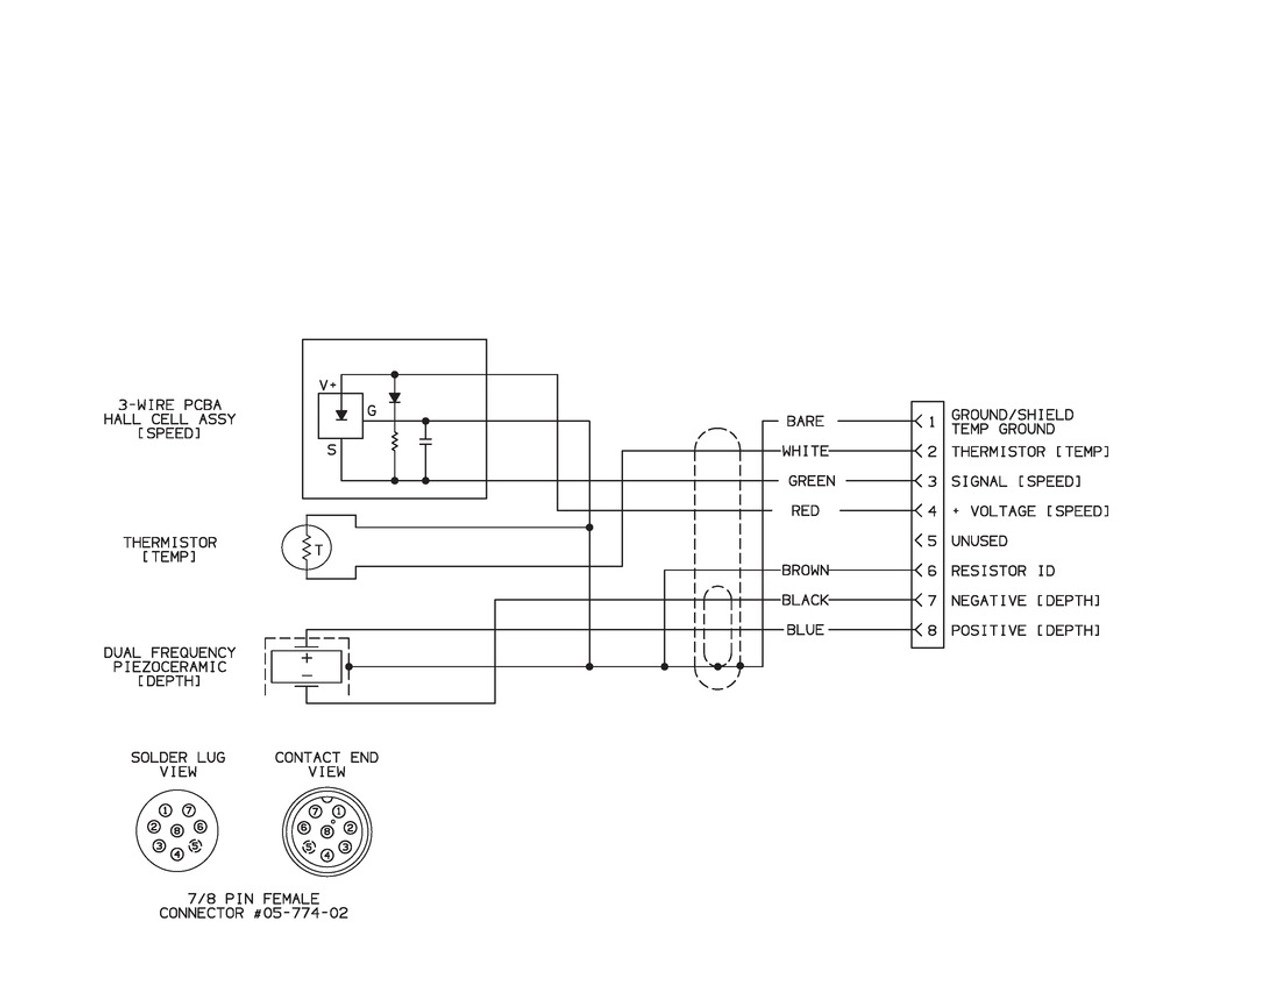 wrg 2785 thermistor wiring diagram dualdepth speed u0026 temperature p66 600w transducers with [ 1280 x 989 Pixel ]